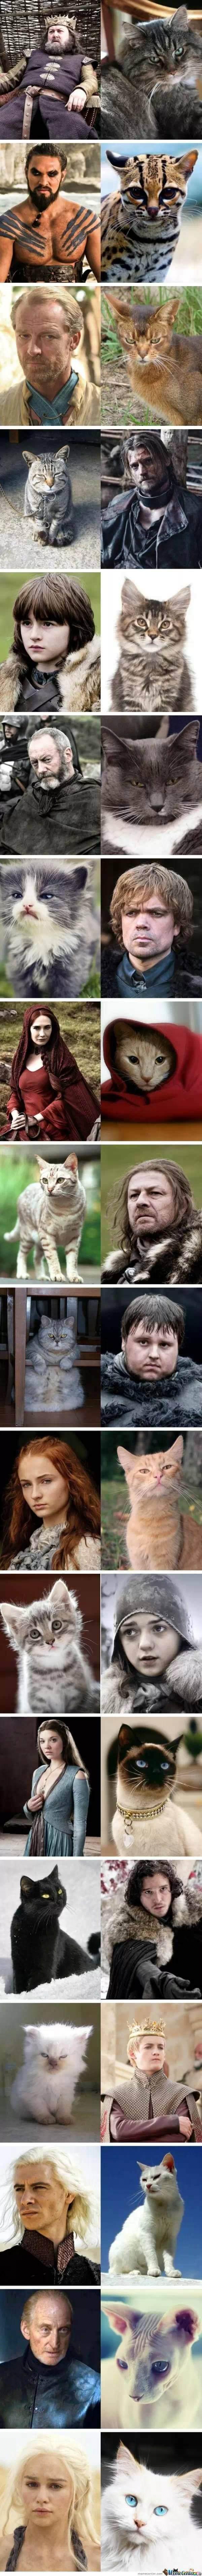 game-of-thrones-cat-version_o_1210494